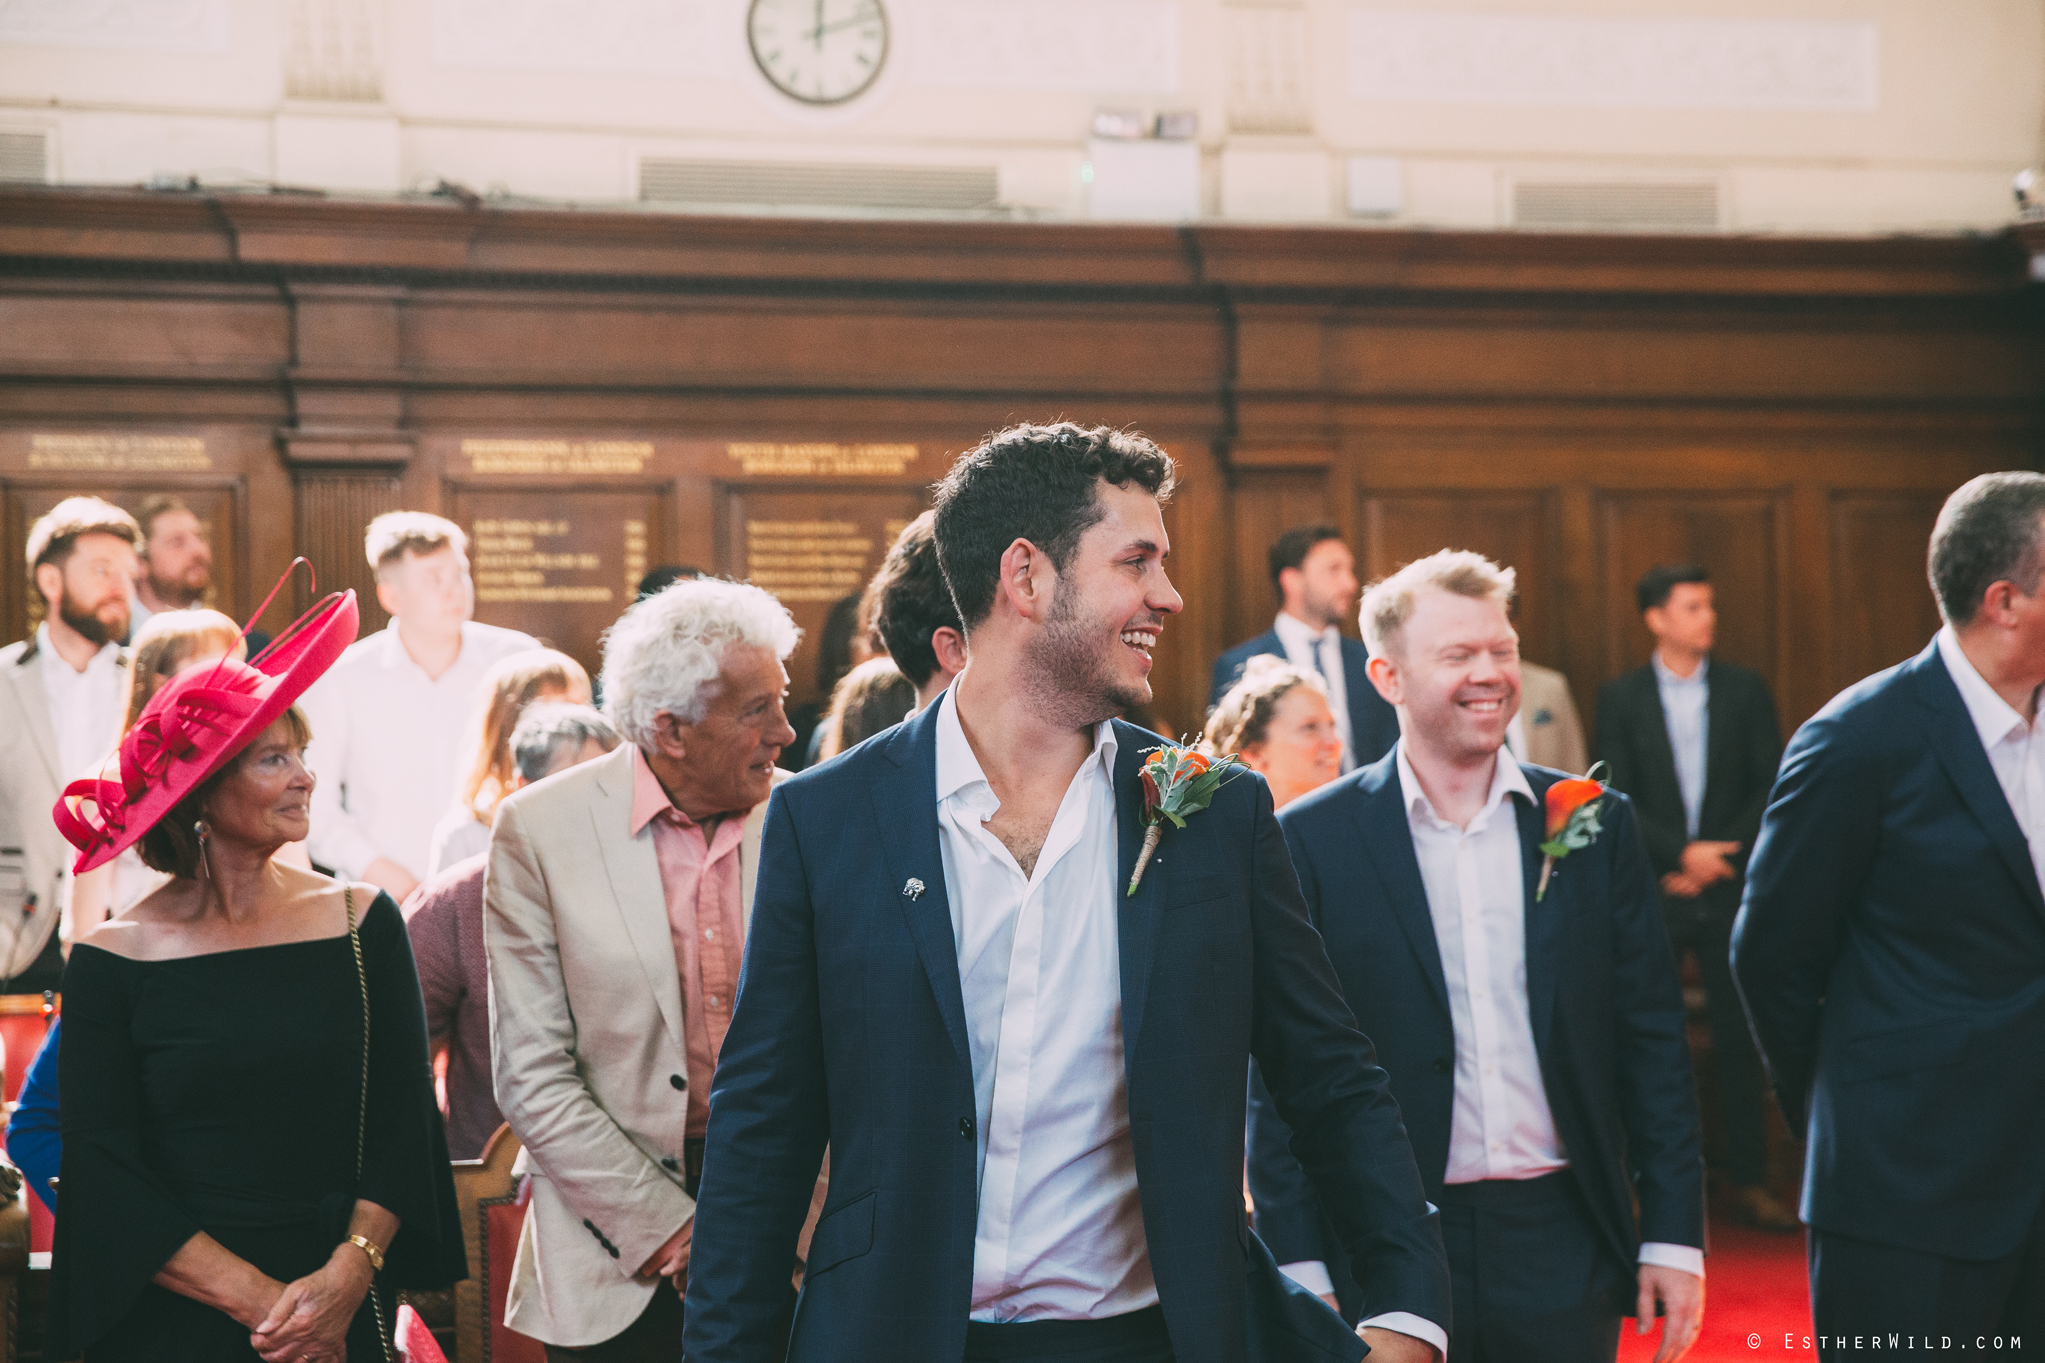 Islington_Town_Hall_Wedding_London_Photographer_Esther_Wild_IMG_4772.jpg